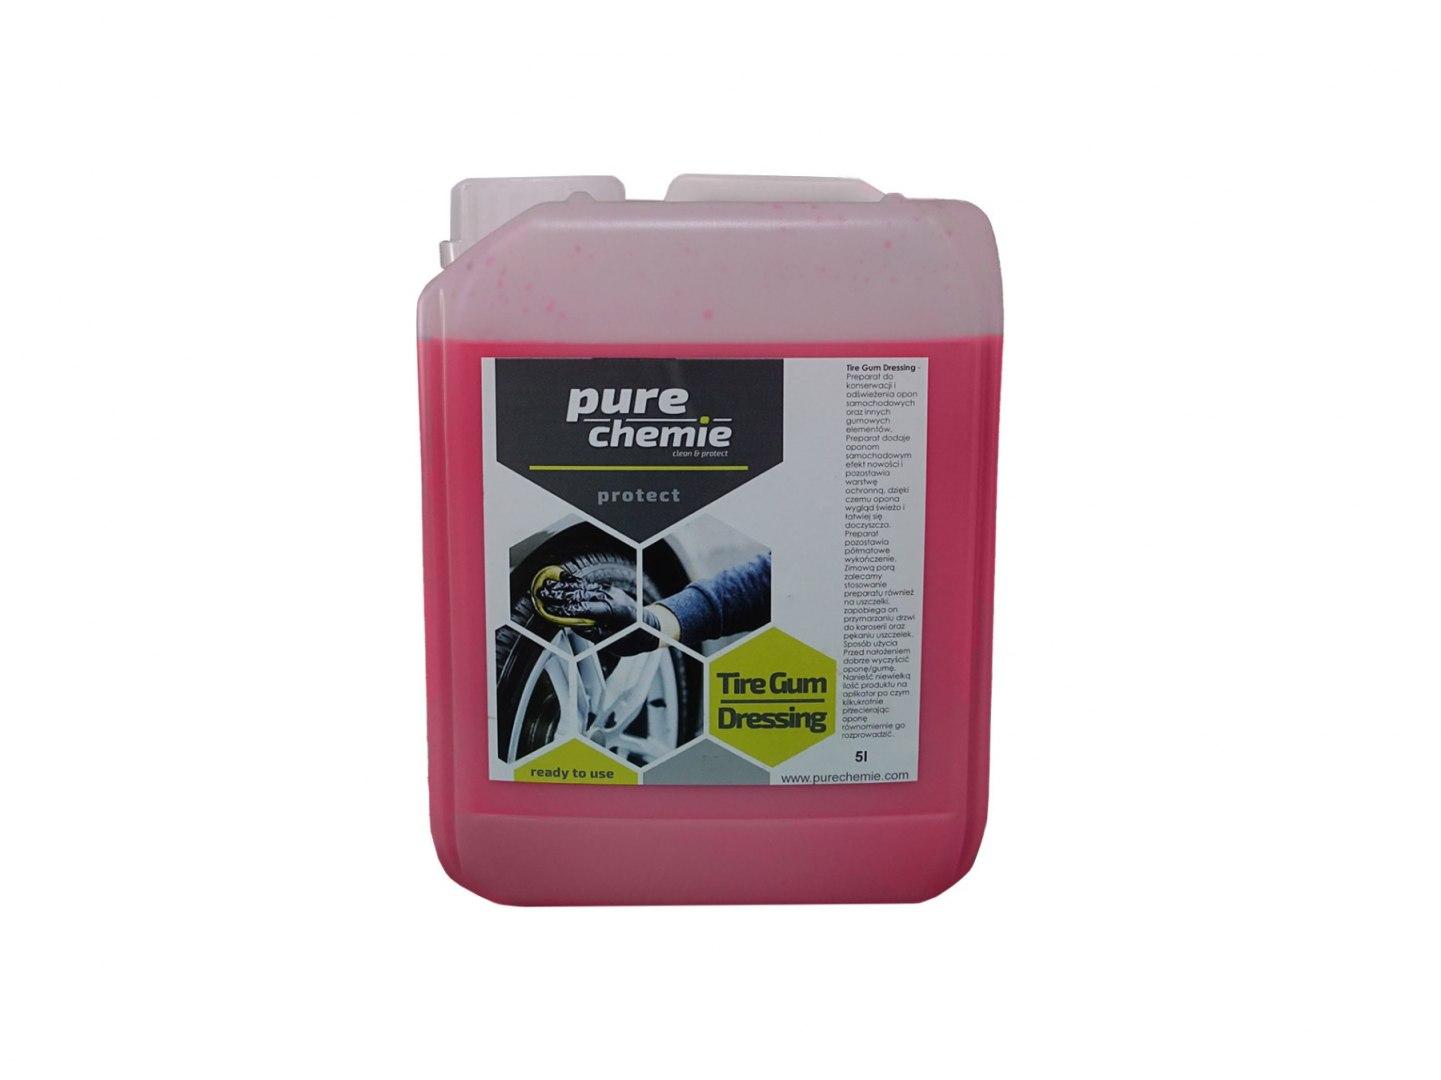 Pure Chemie Tire Gum Dressing 5L (Dressing do opon) - GRUBYGARAGE - Sklep Tuningowy